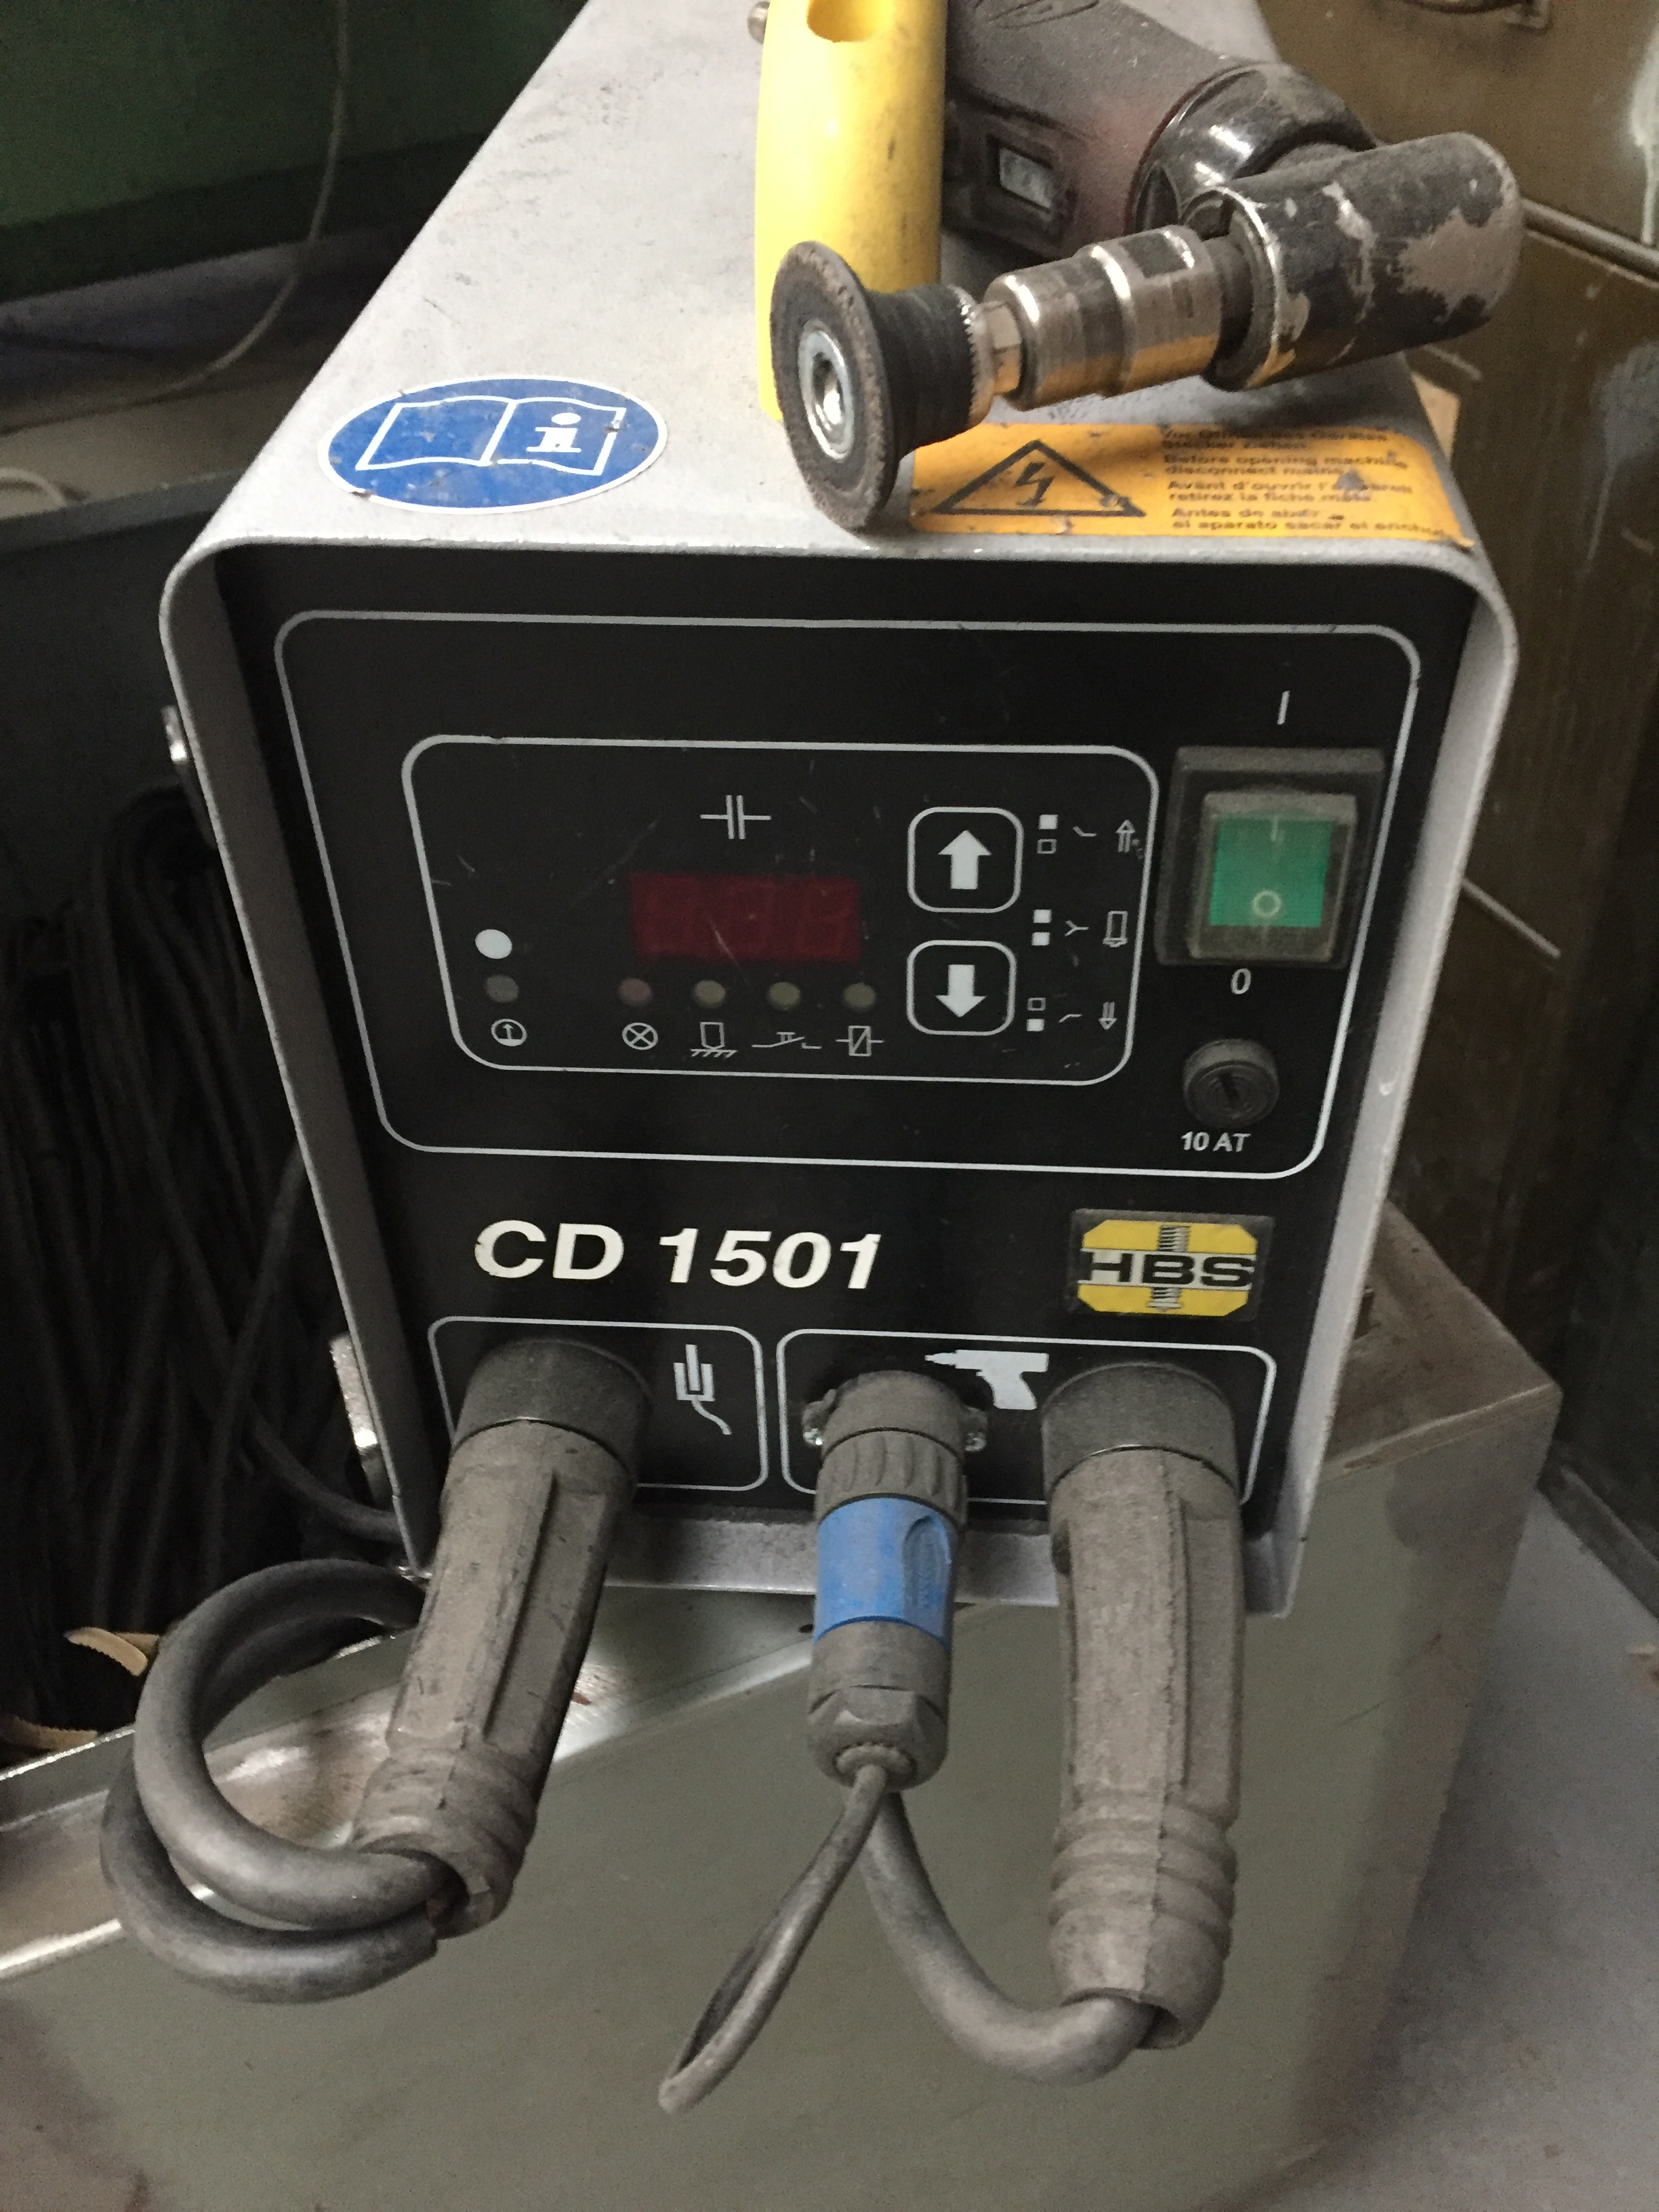 HBS CD 1501 EPUB DOWNLOAD